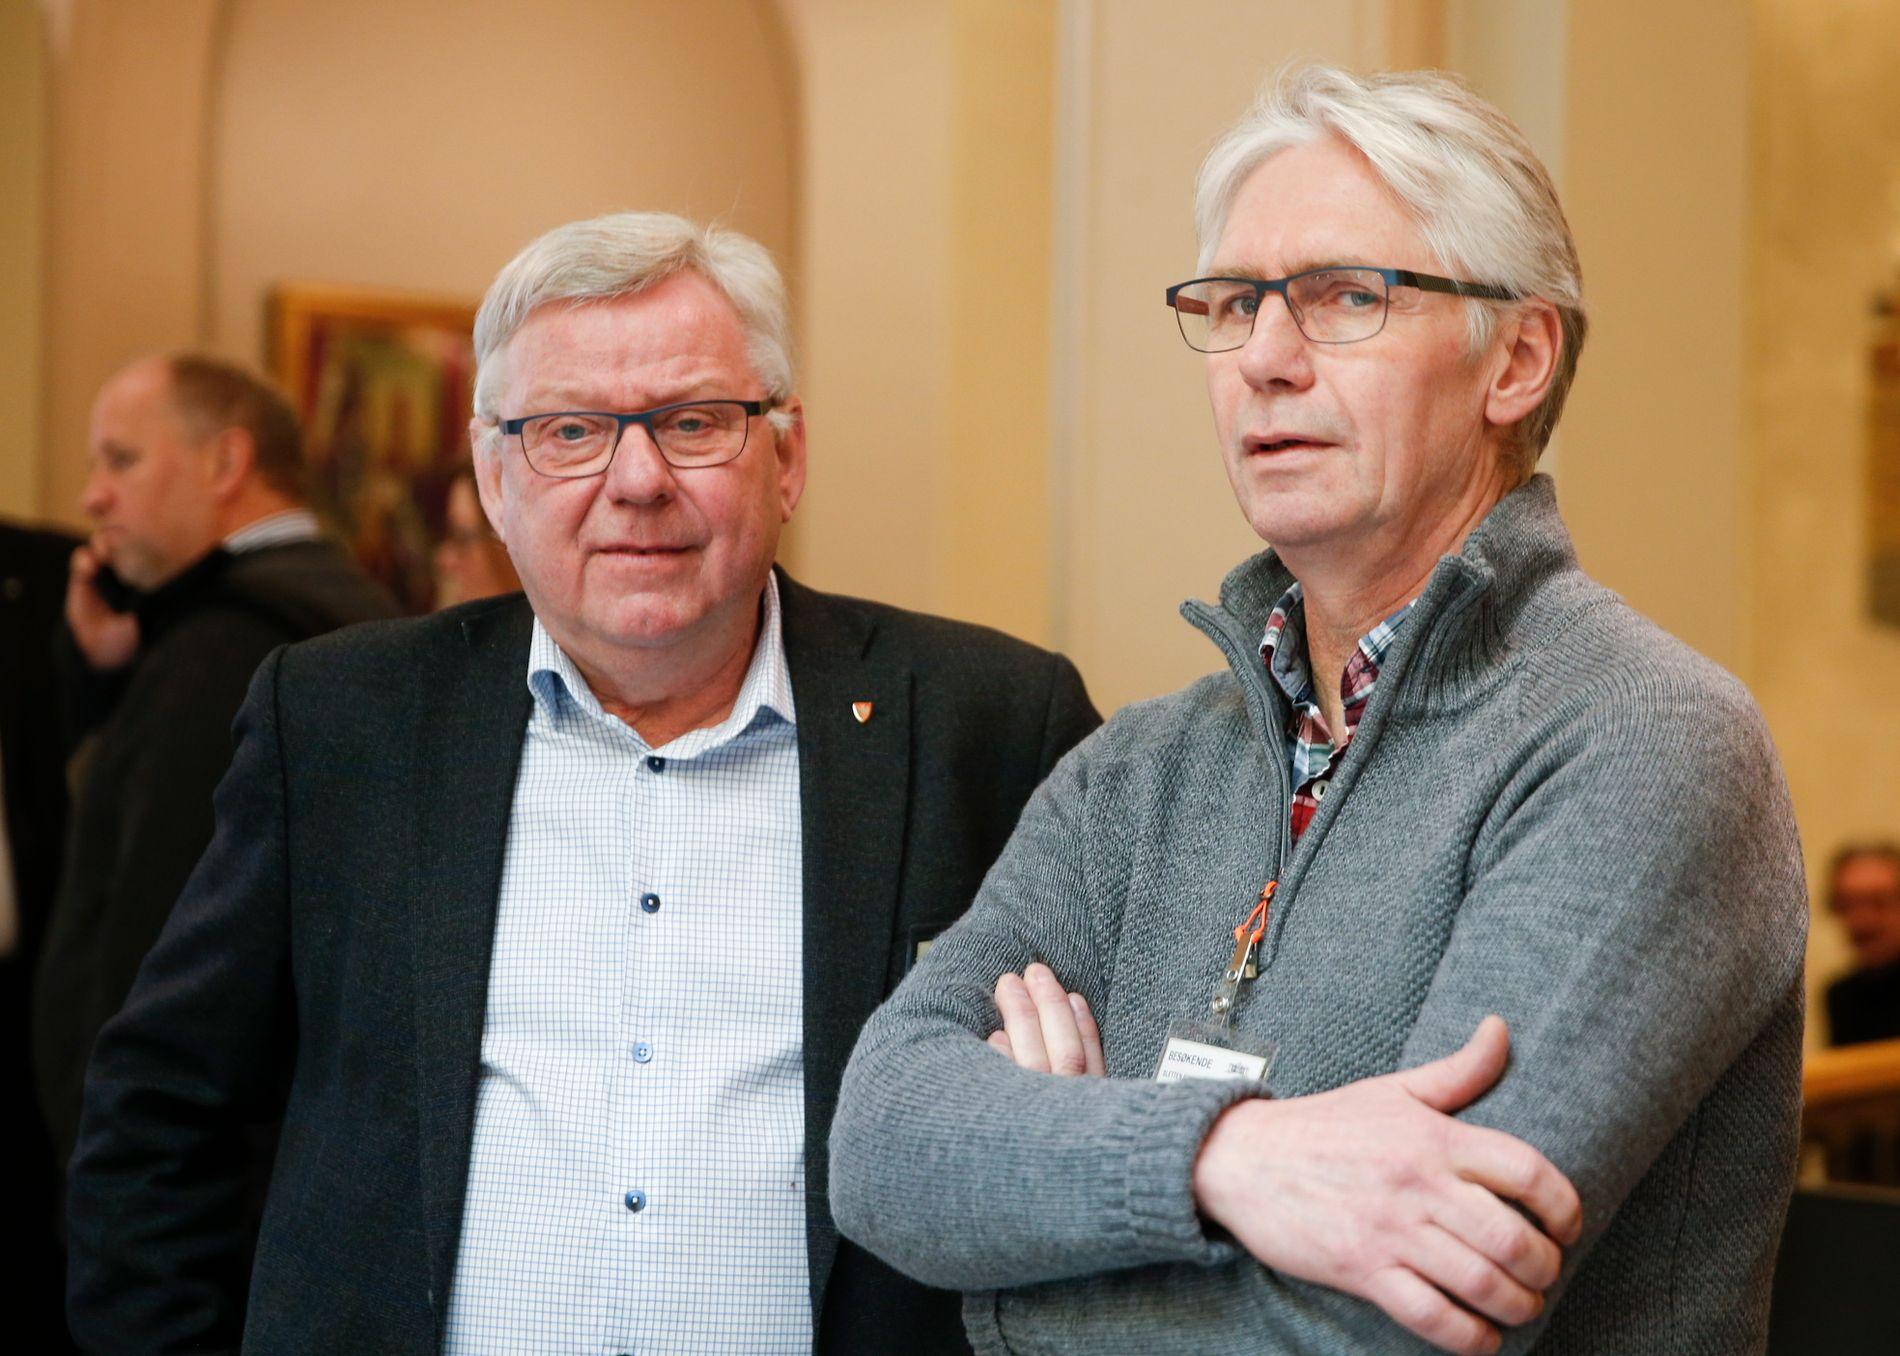 MANGLER TILLIT: Ordførerne fra Trysil og Elverum, Erik Sletten (Sp) og Erik Hanstad (H), fotografert i Stortingets vandrehall i januar i år.